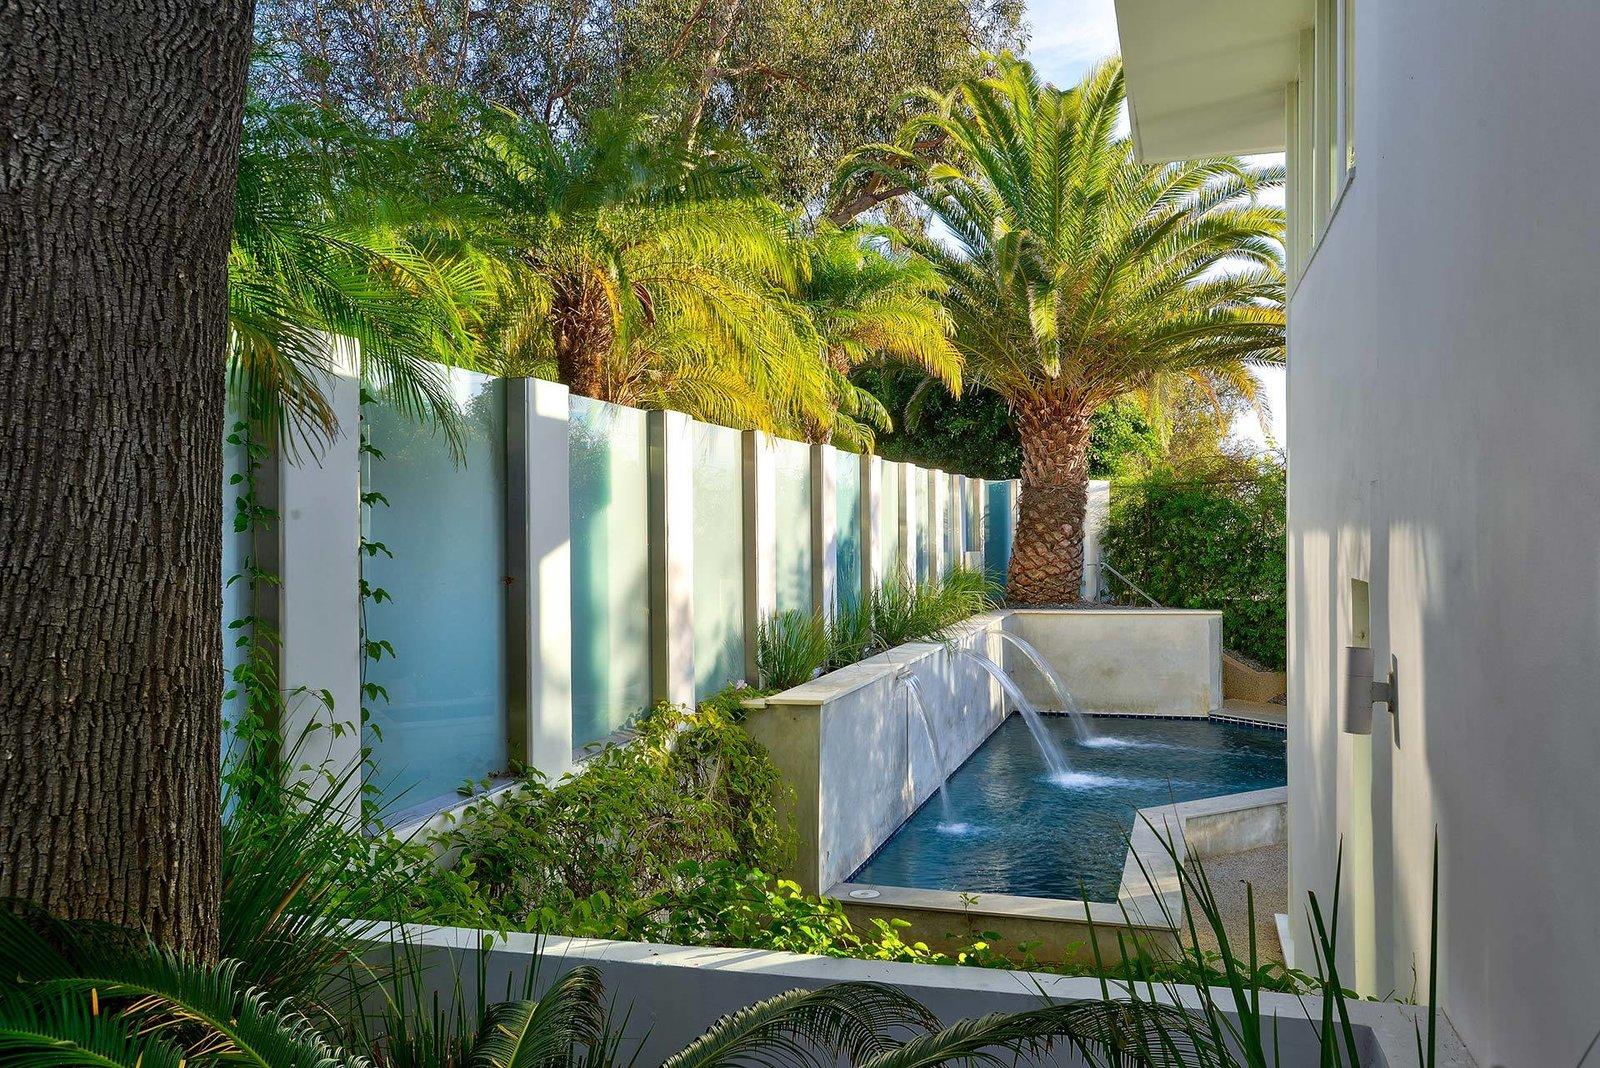 Actor Brendan Fraser's Former Beverly Hills Home Is For Sale For $4.25 Million - Photo 12 of 13